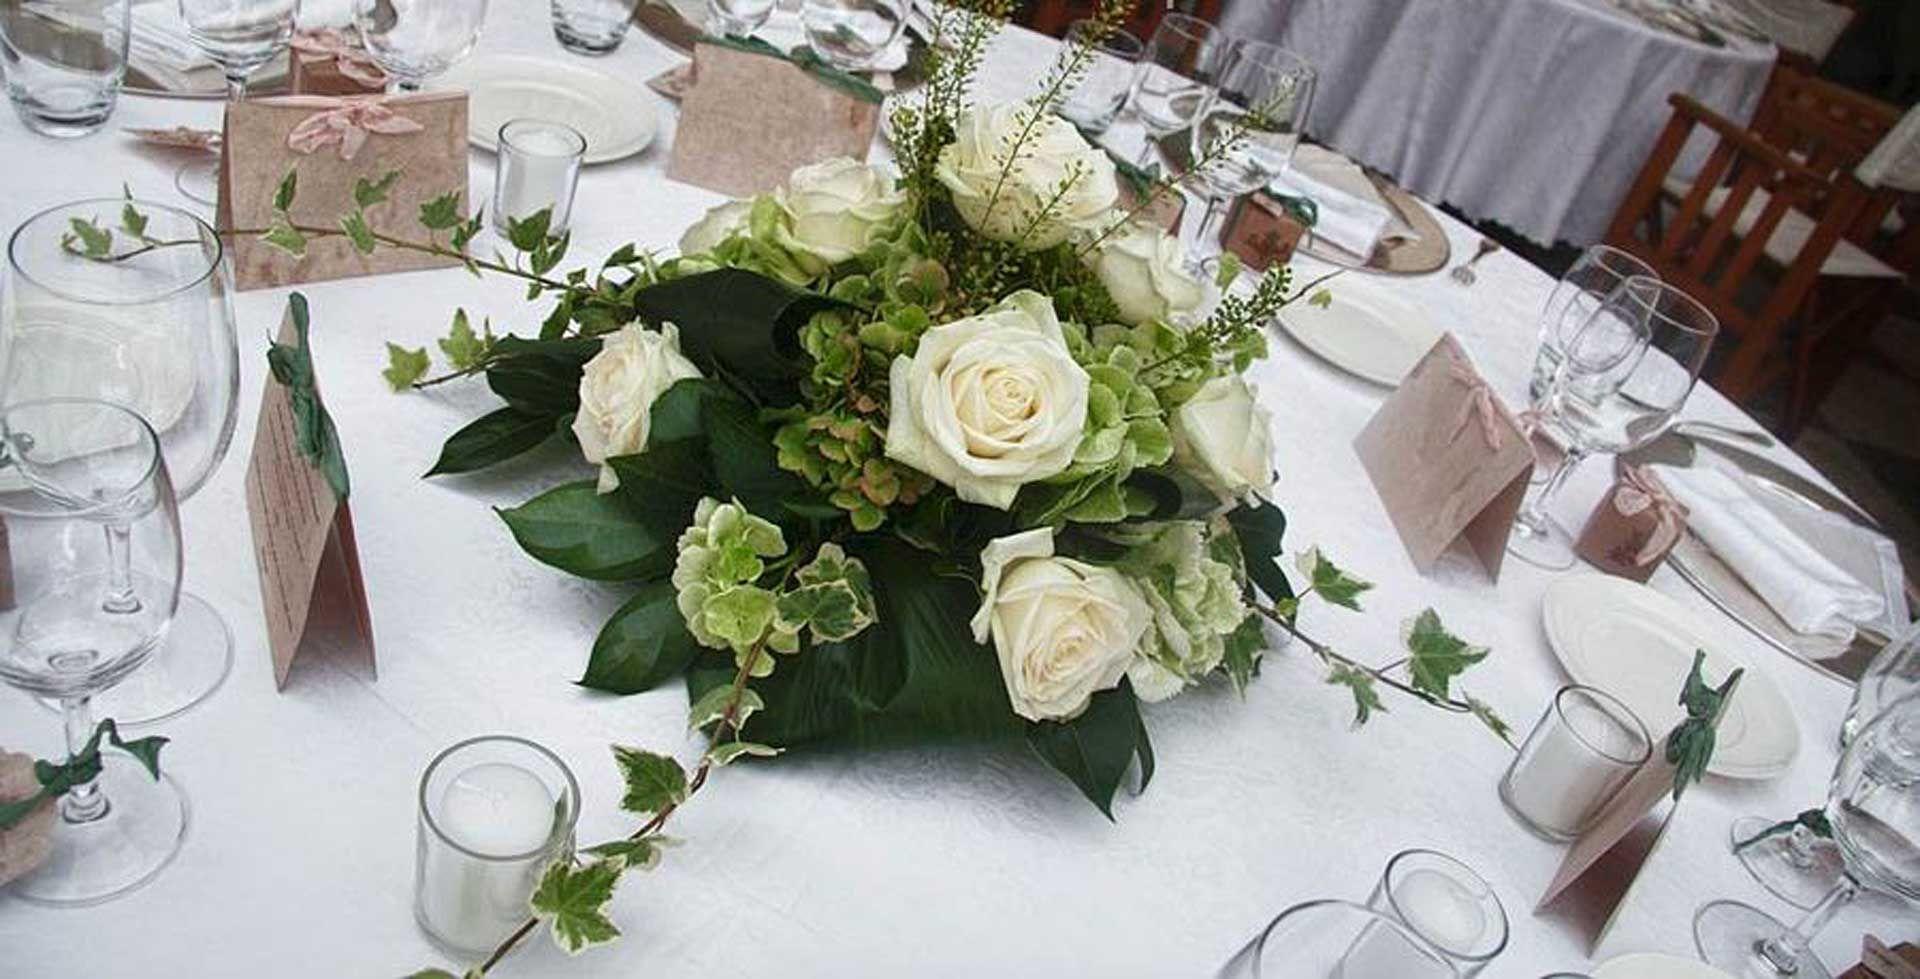 Centrotavola Composizione Floreale Shabby Chic Matrimonio Matrimonio Shabby Chic Fiori Per Matrimoni